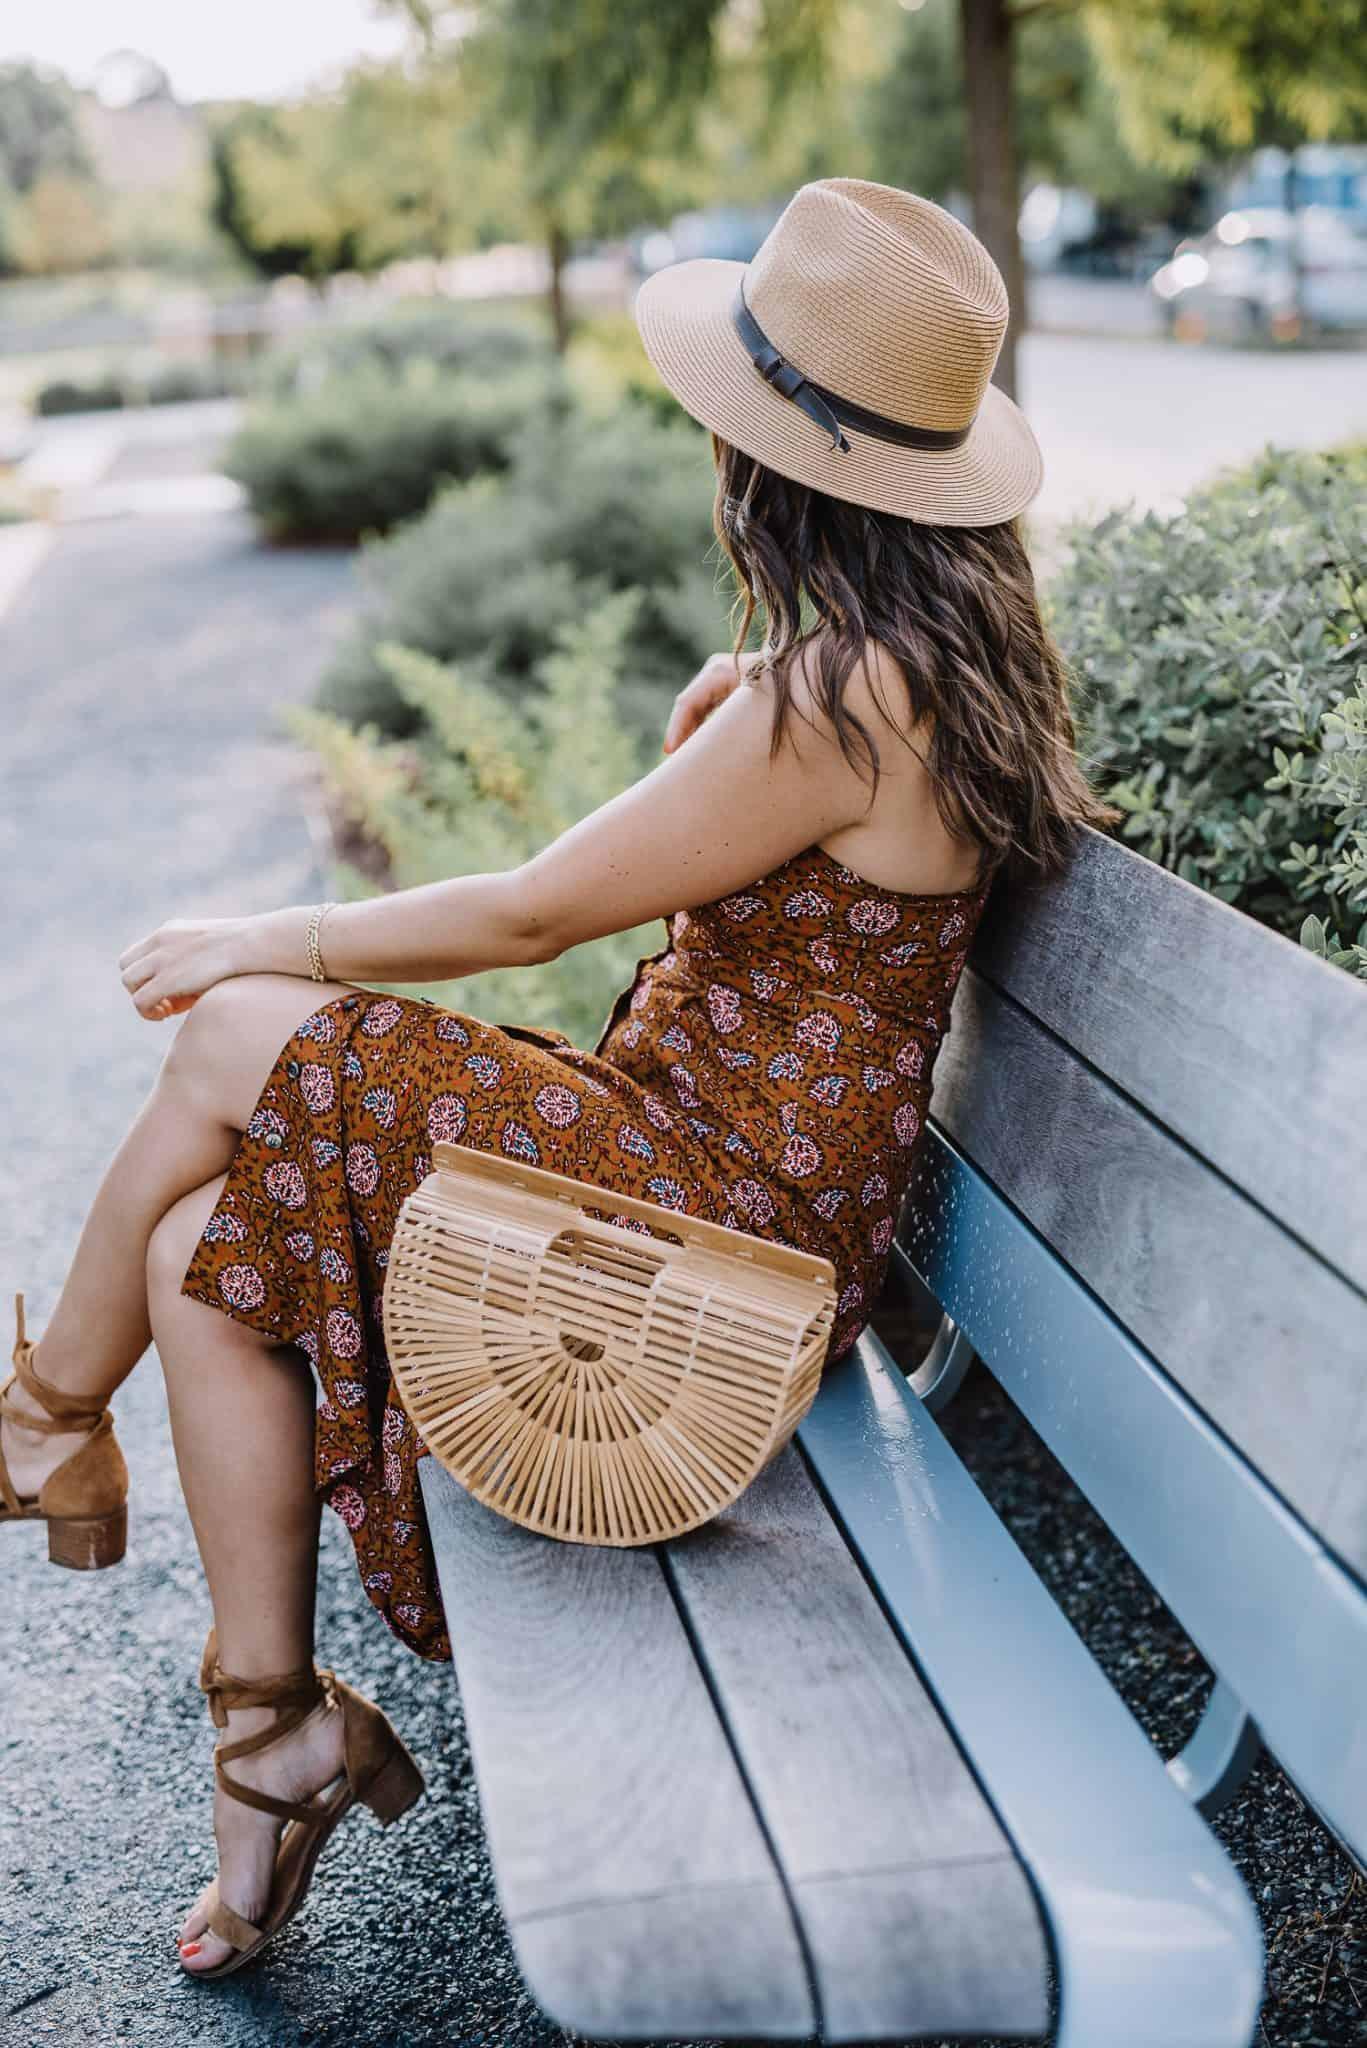 midi dress, summer outfit ideas - My Style Vita